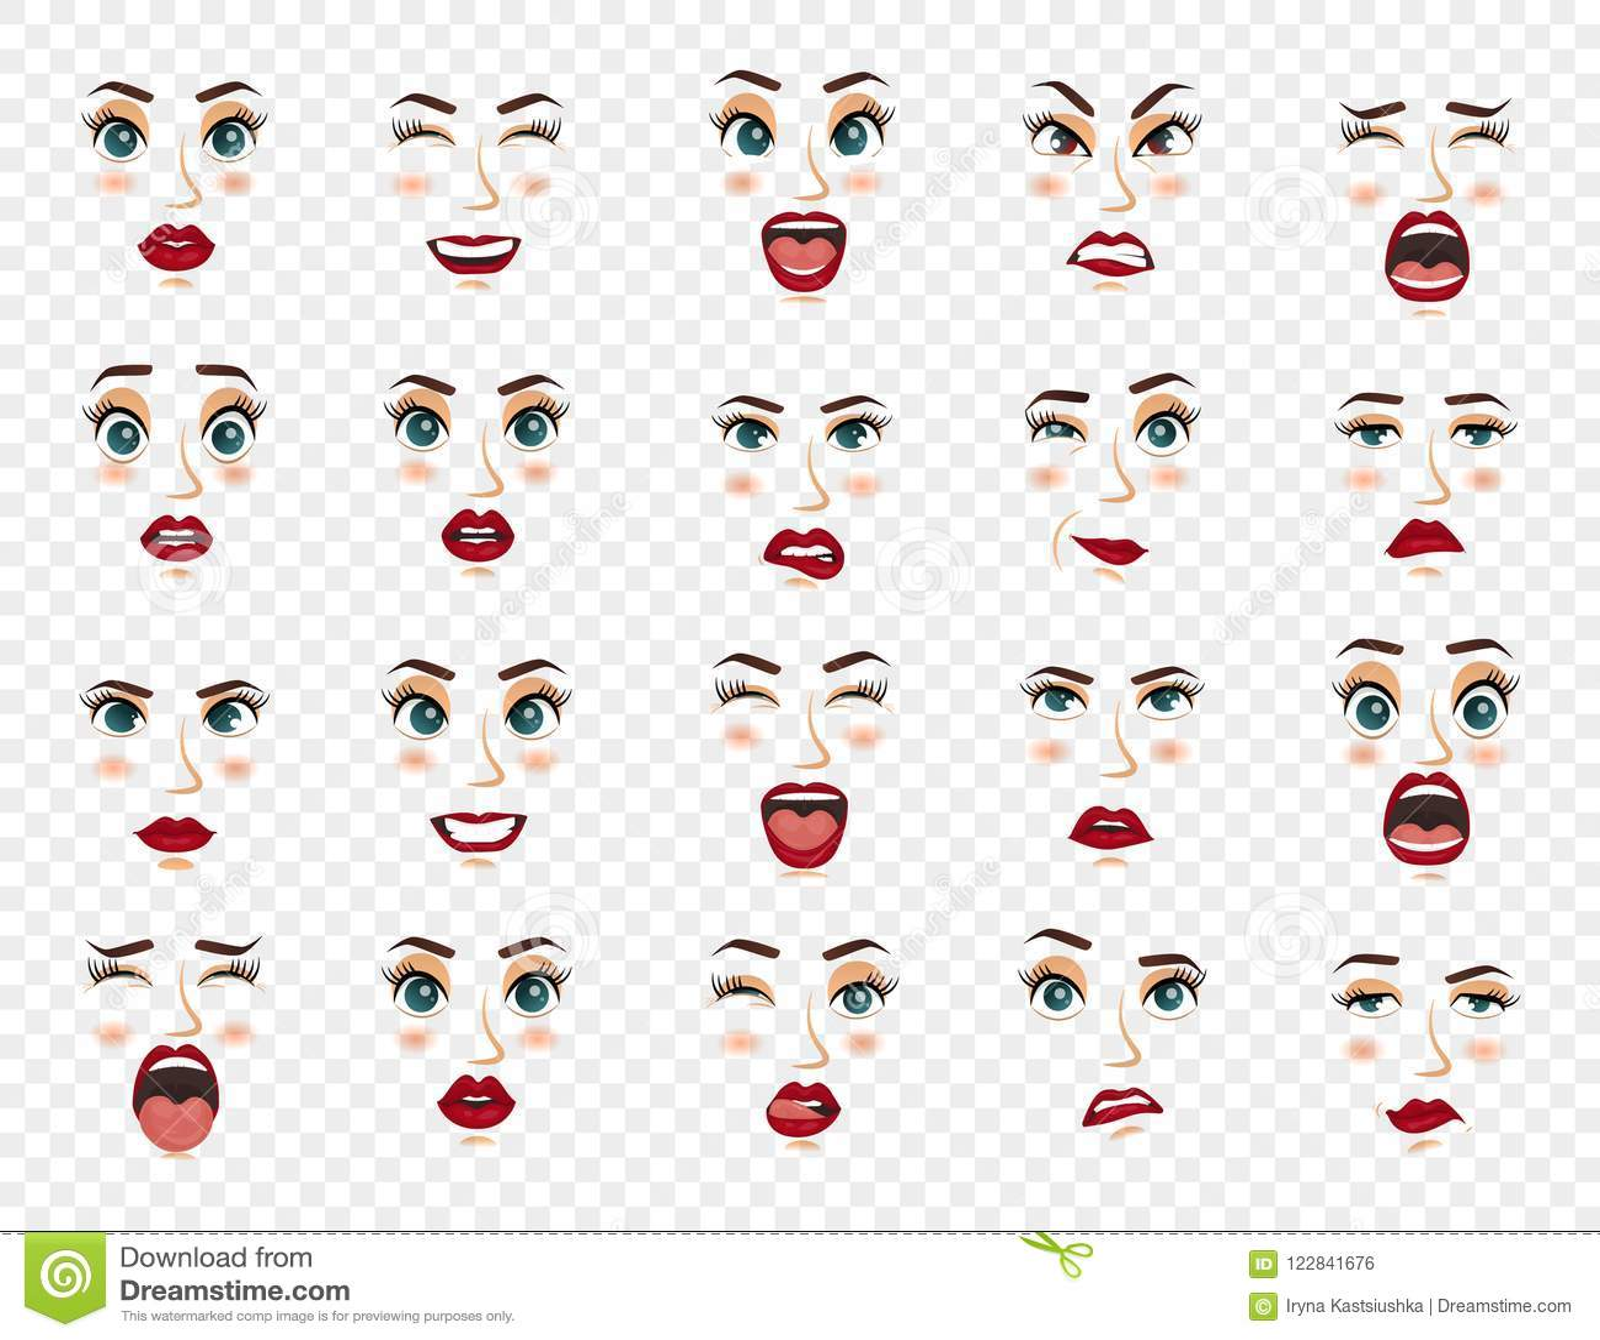 download 可笑的情感 妇女表情,姿态,情感幸福惊奇憎恶悲伤着迷失望图片